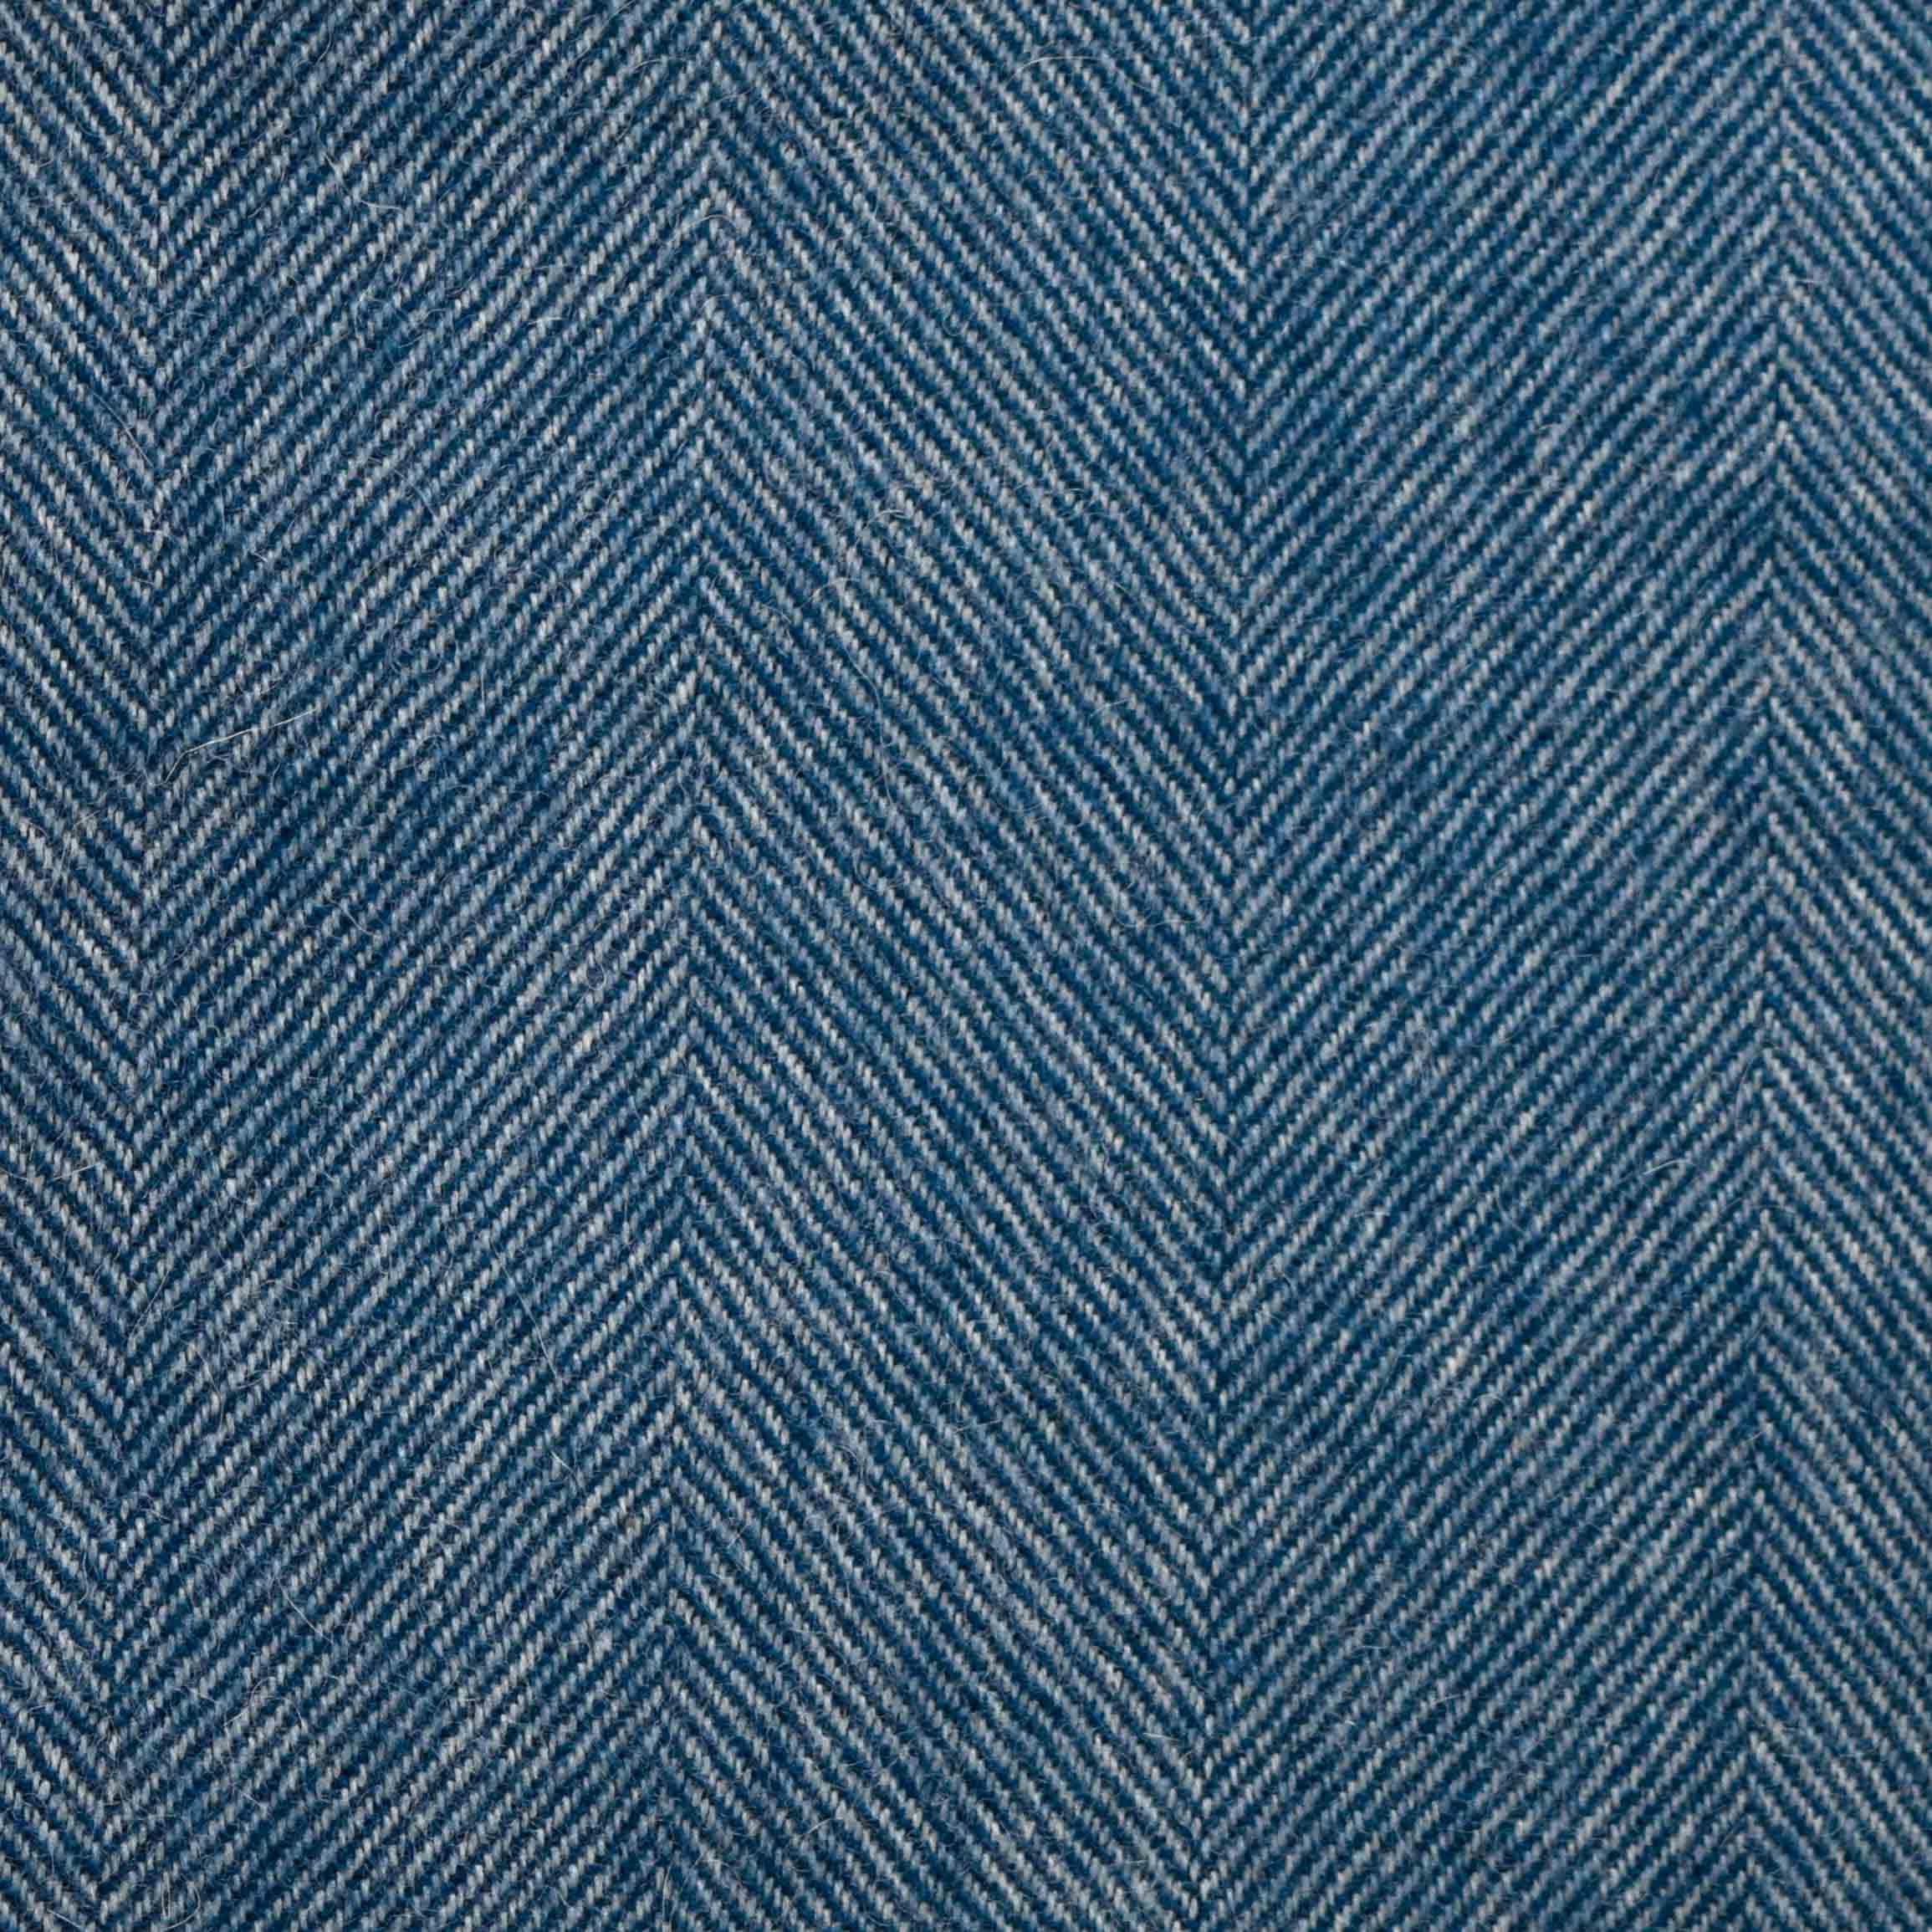 Denim Blue Herringbone